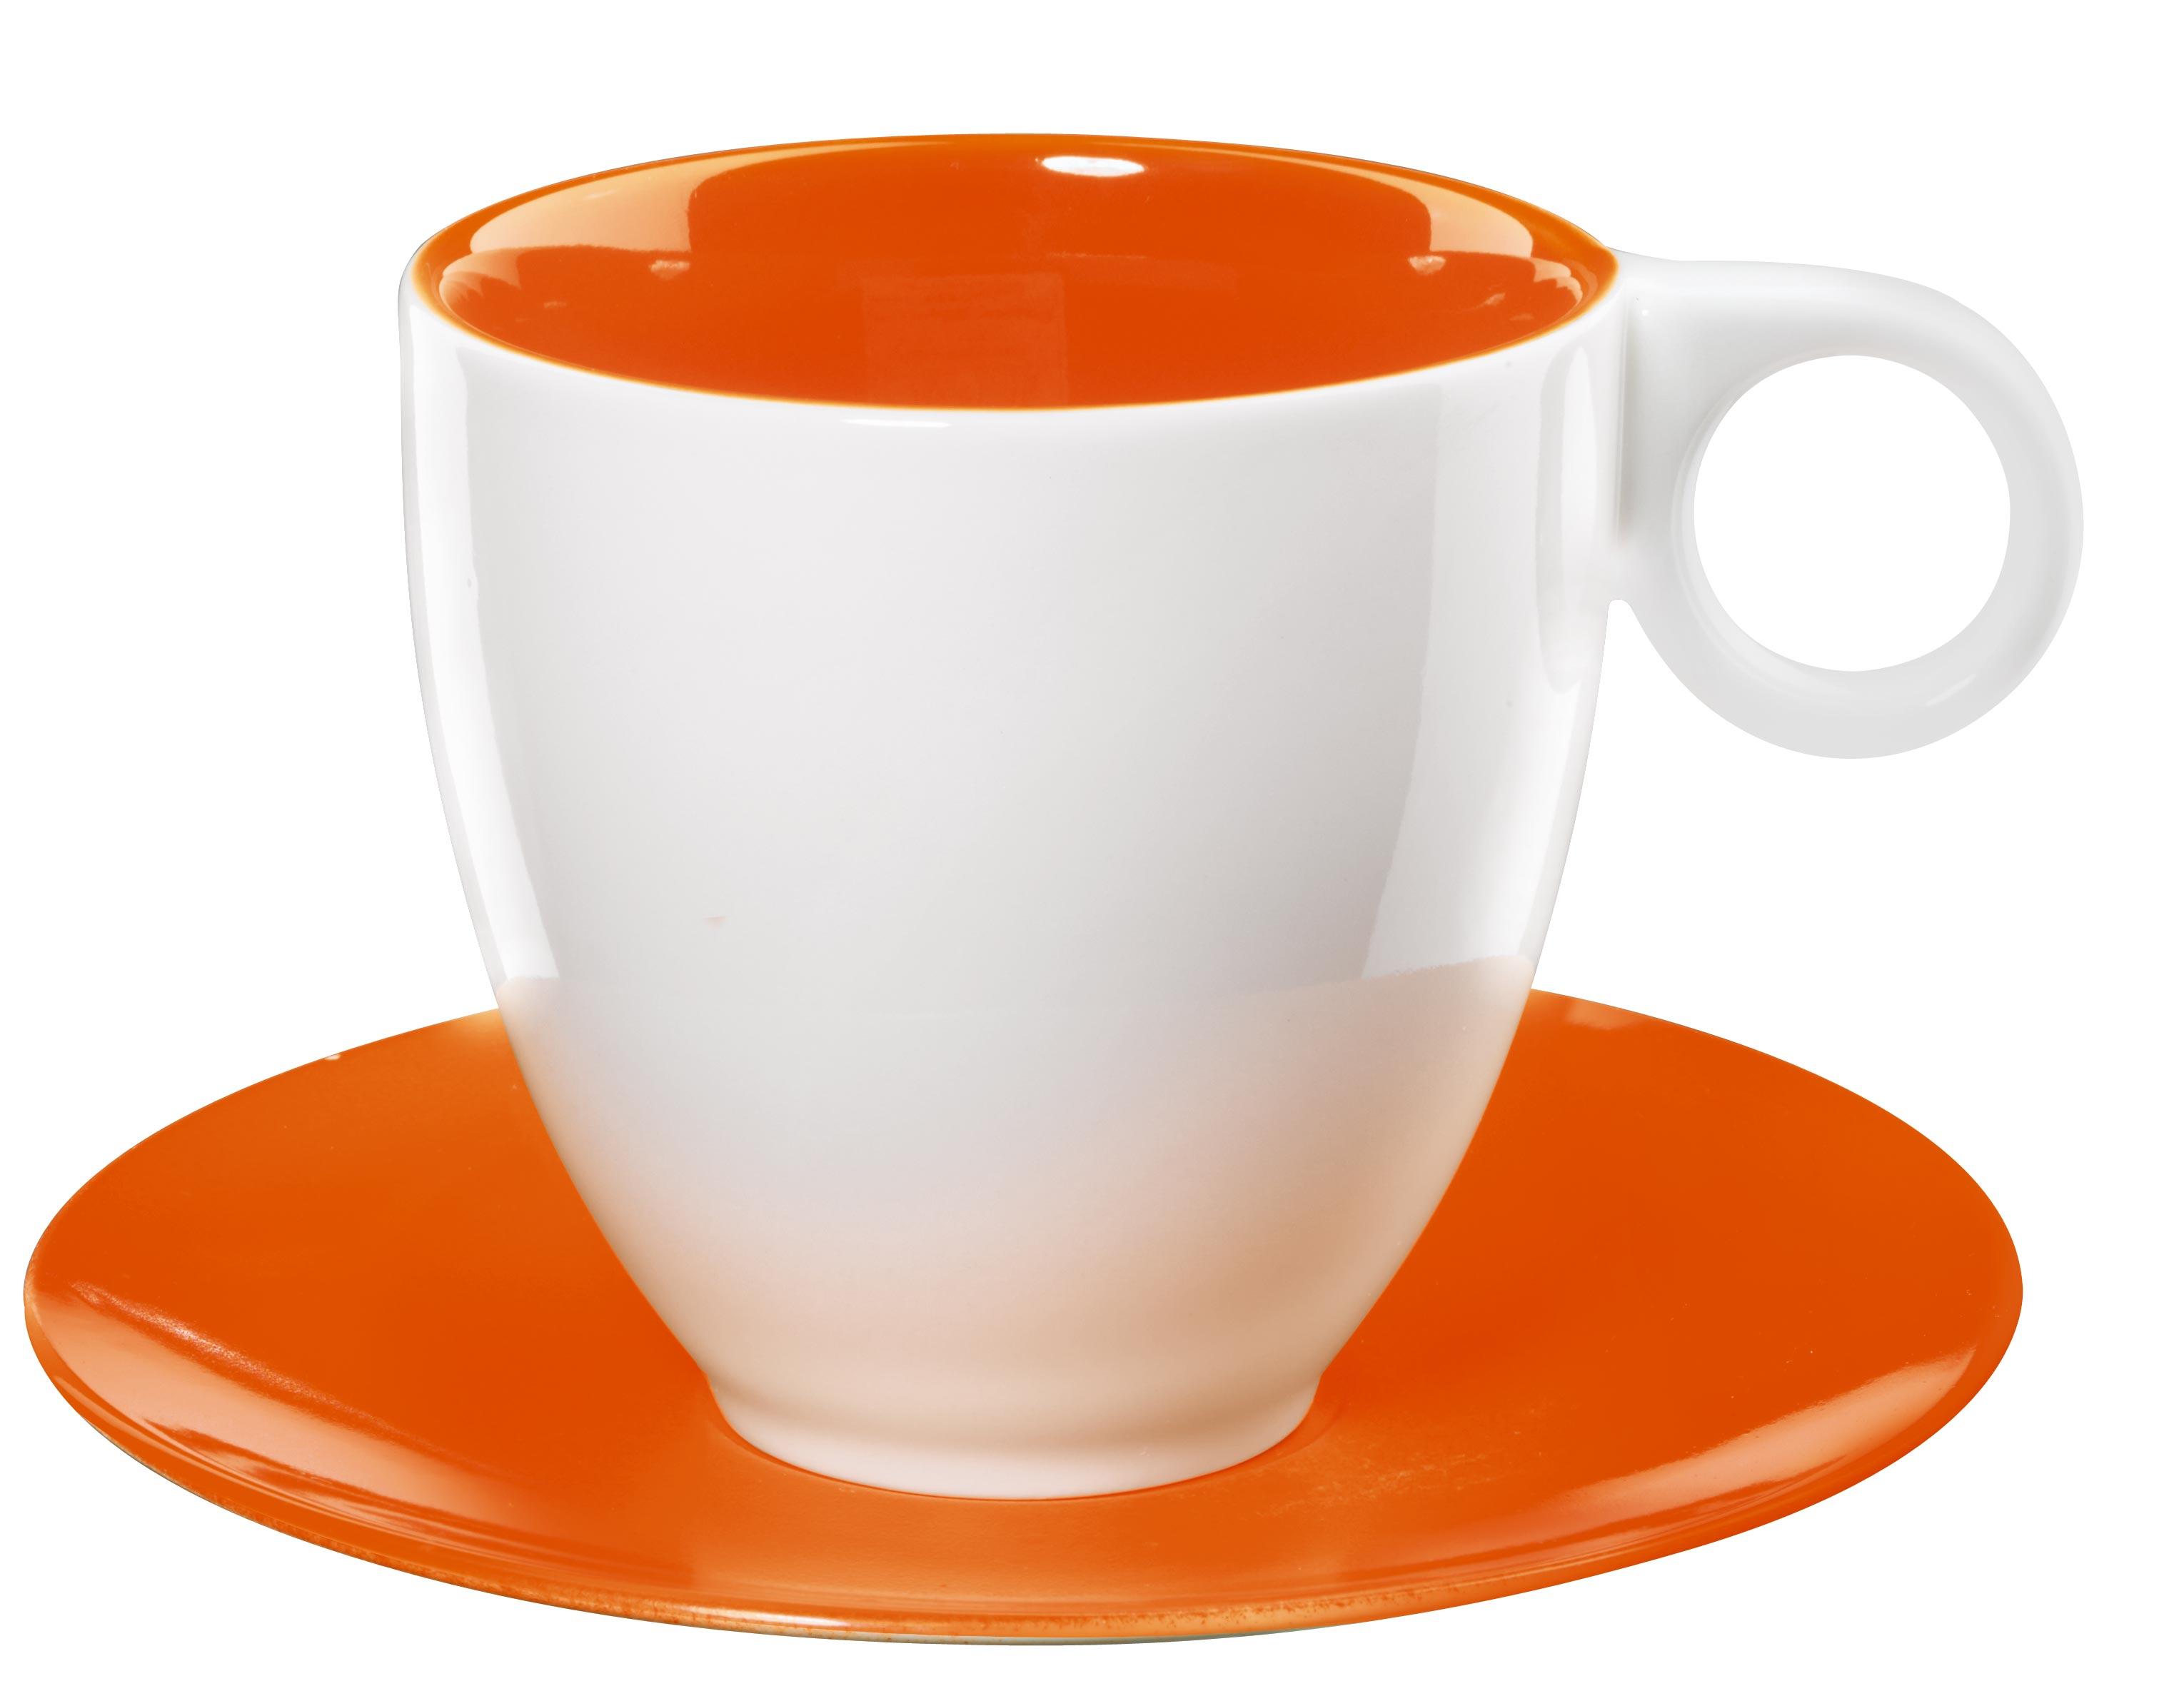 kaffeetasse mit unterer home by asa die asa selection wohnwelten. Black Bedroom Furniture Sets. Home Design Ideas